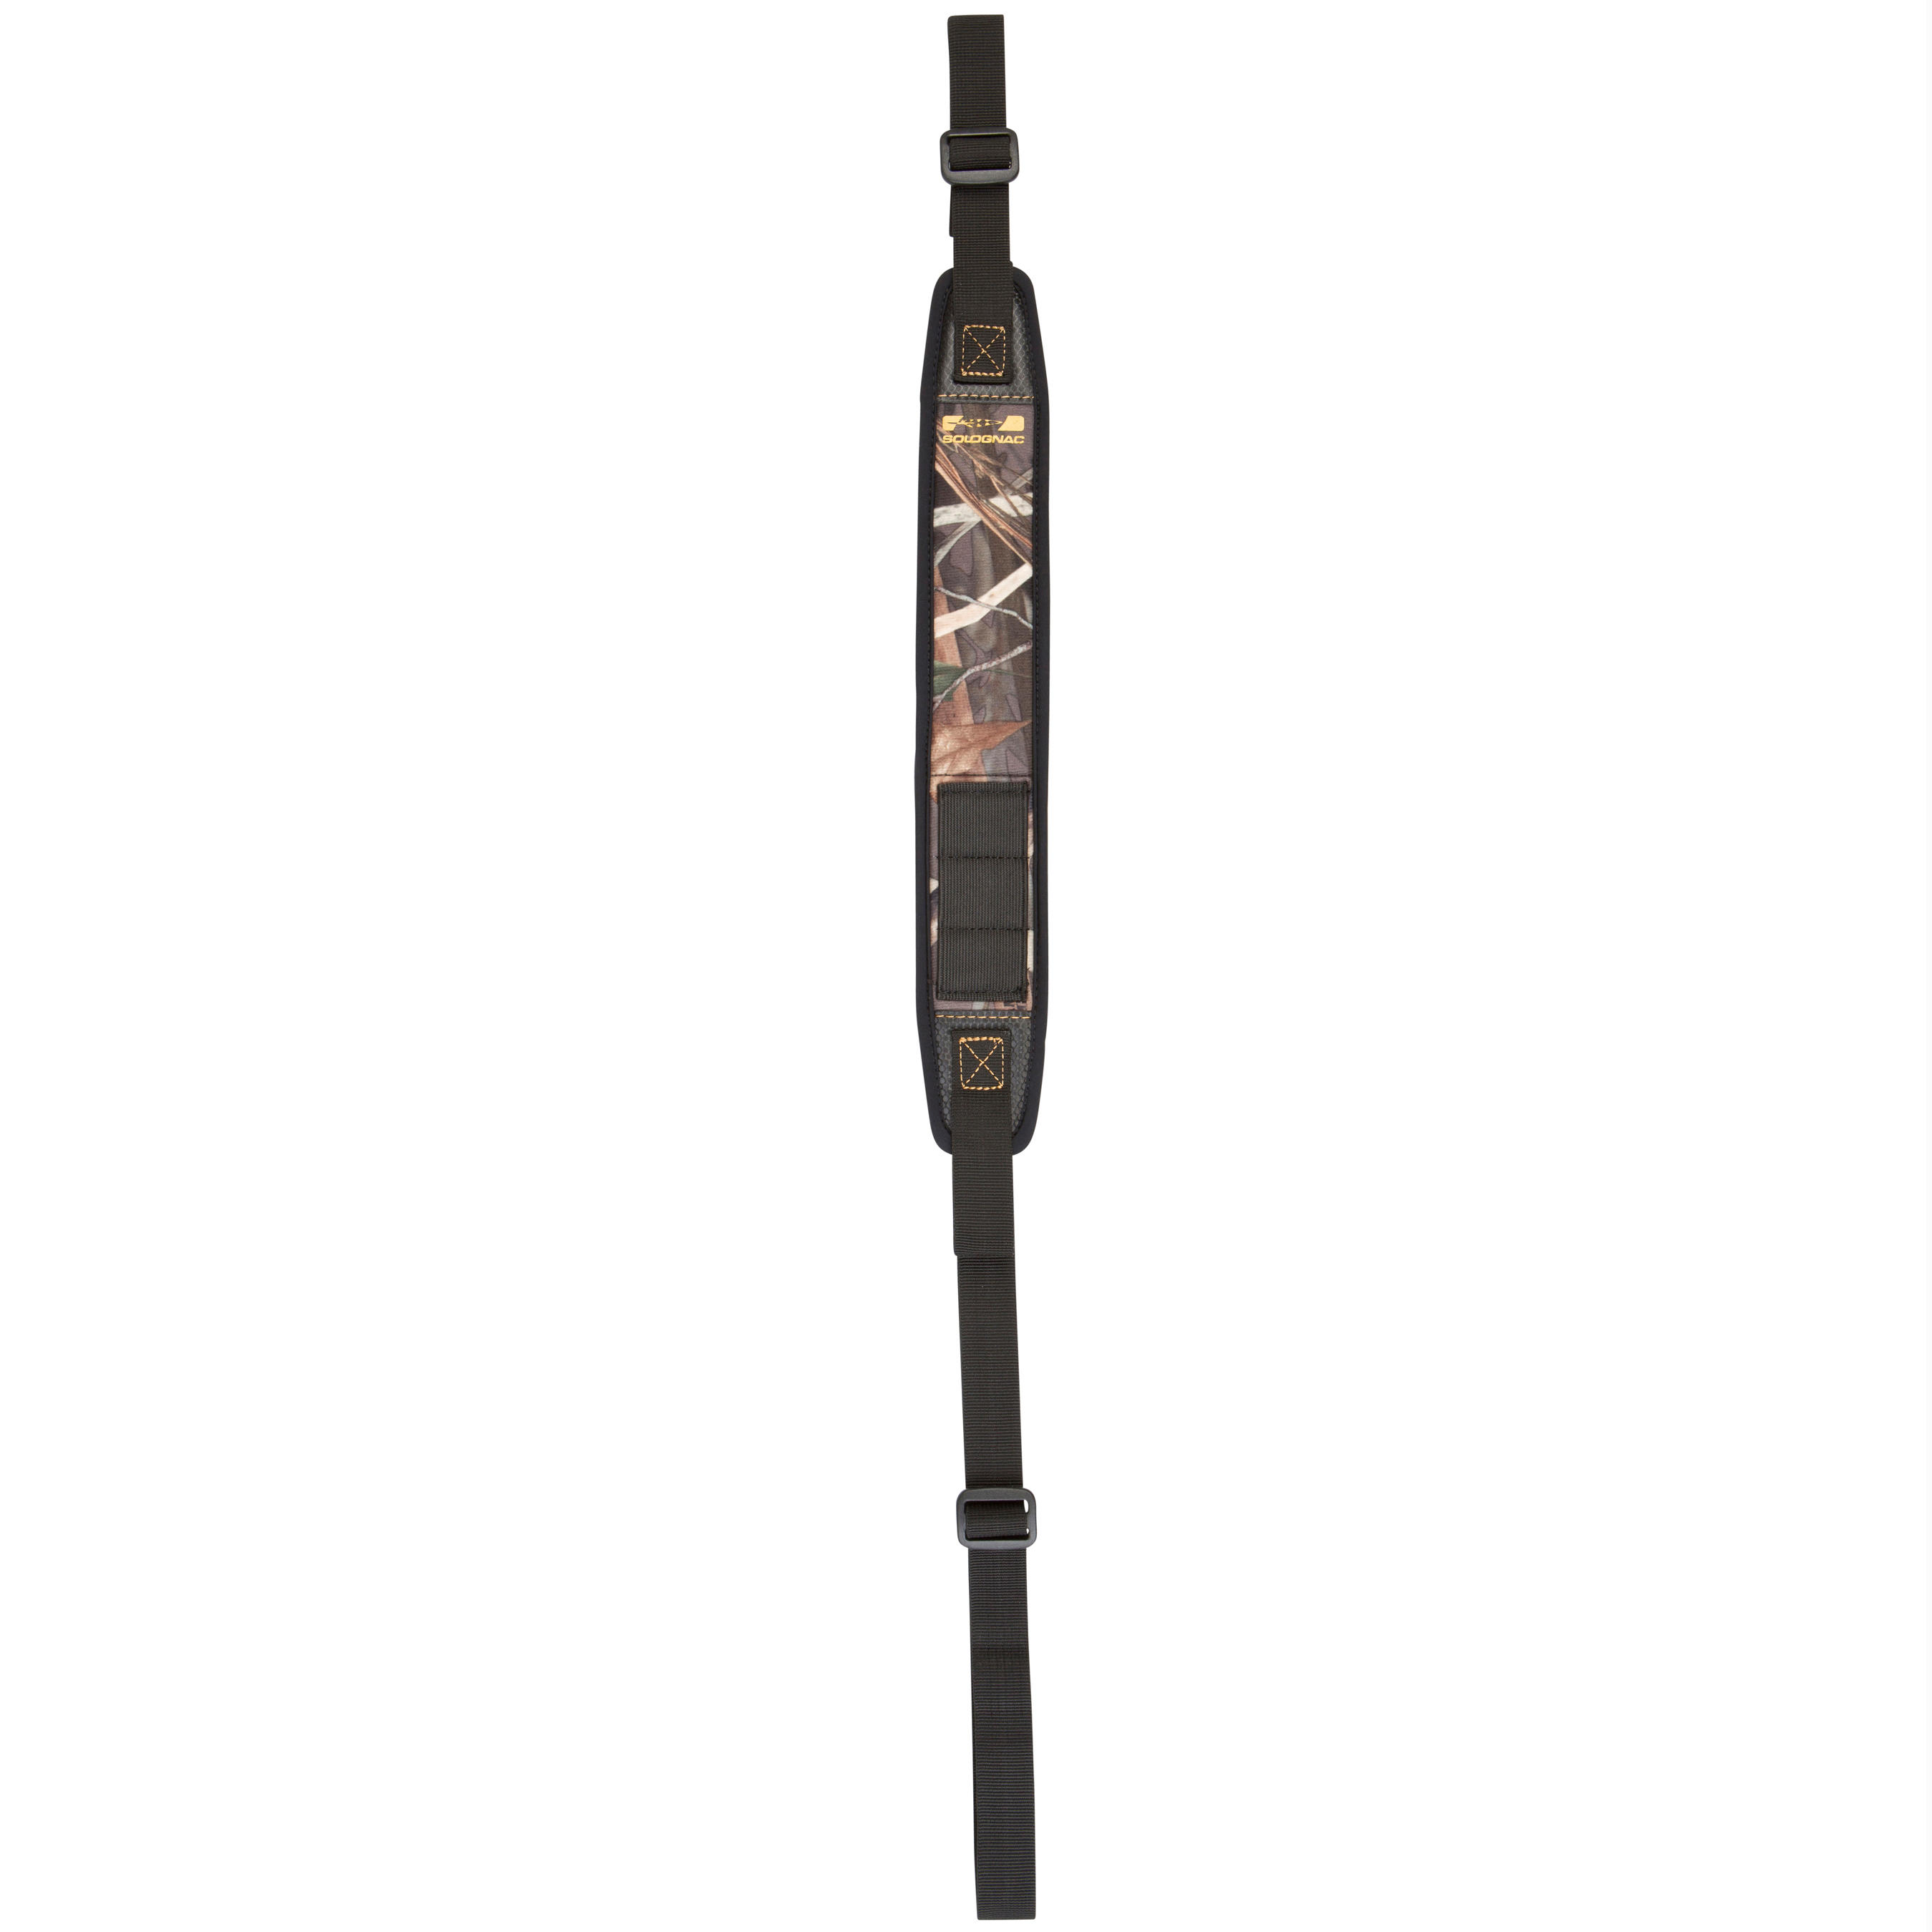 300 Neo gun sling - wetlands camouflage